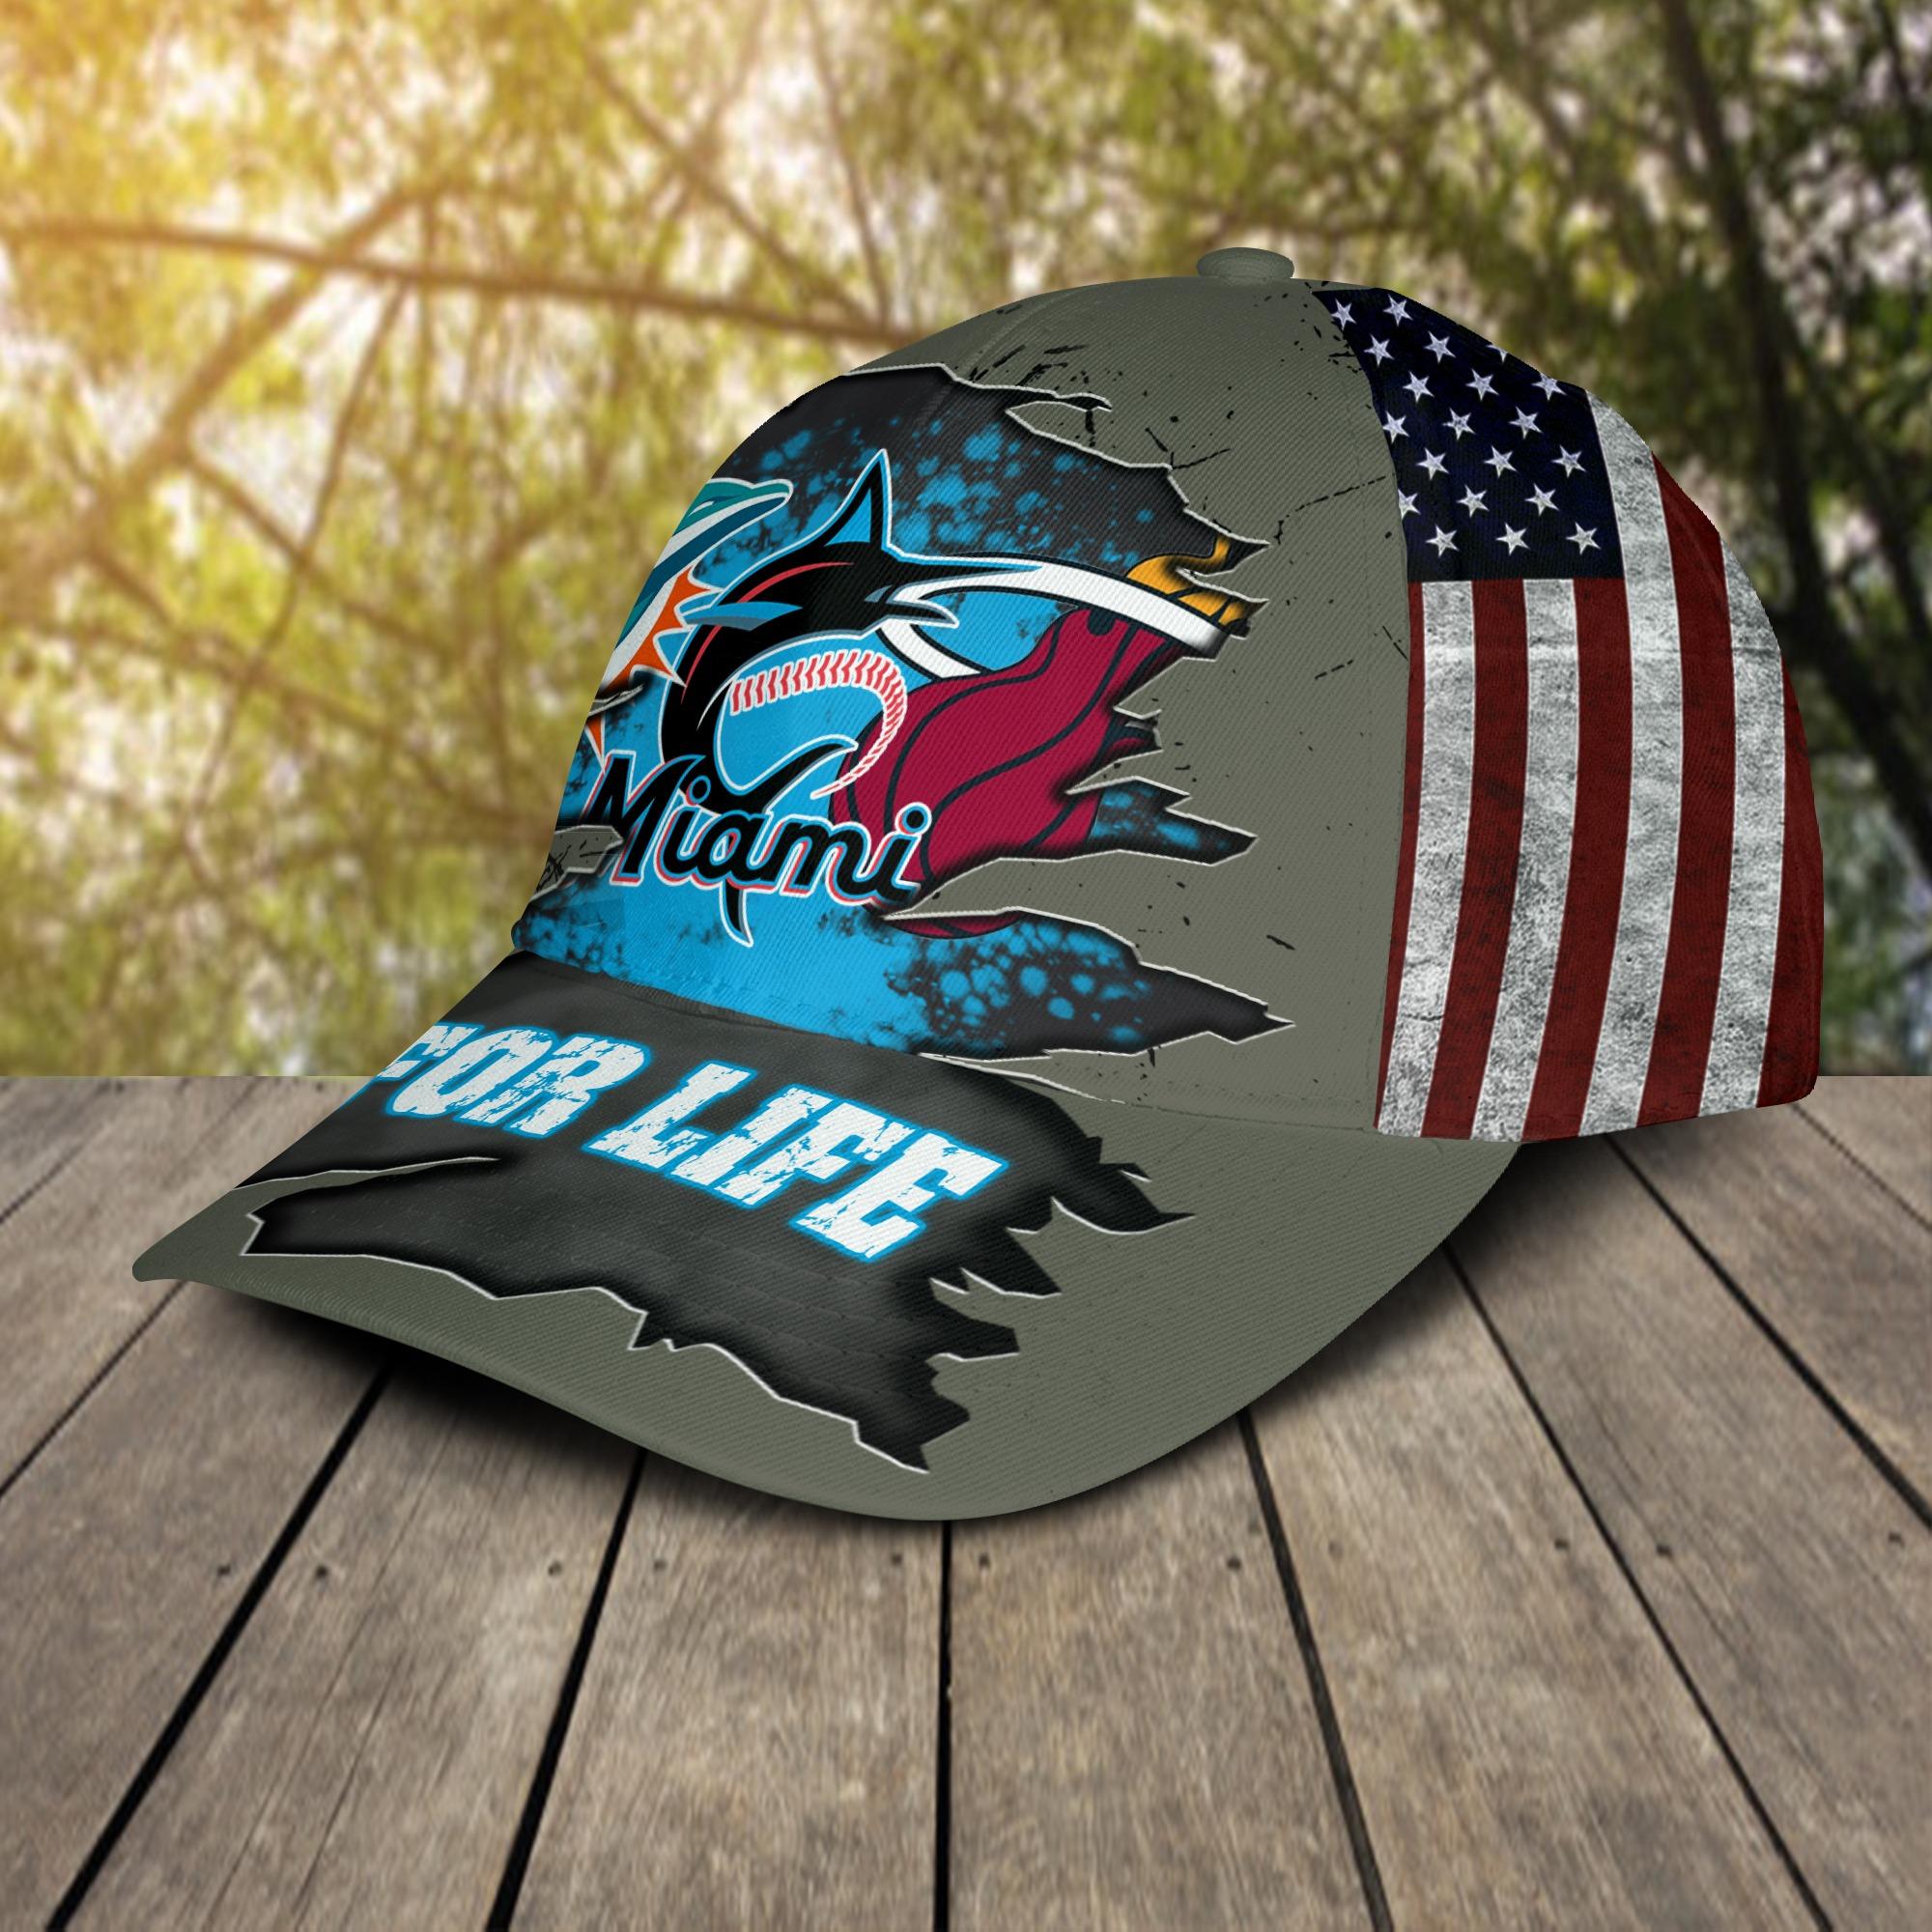 Miami Dolphins Miami Marlins Miami Heat For Life Cap 2